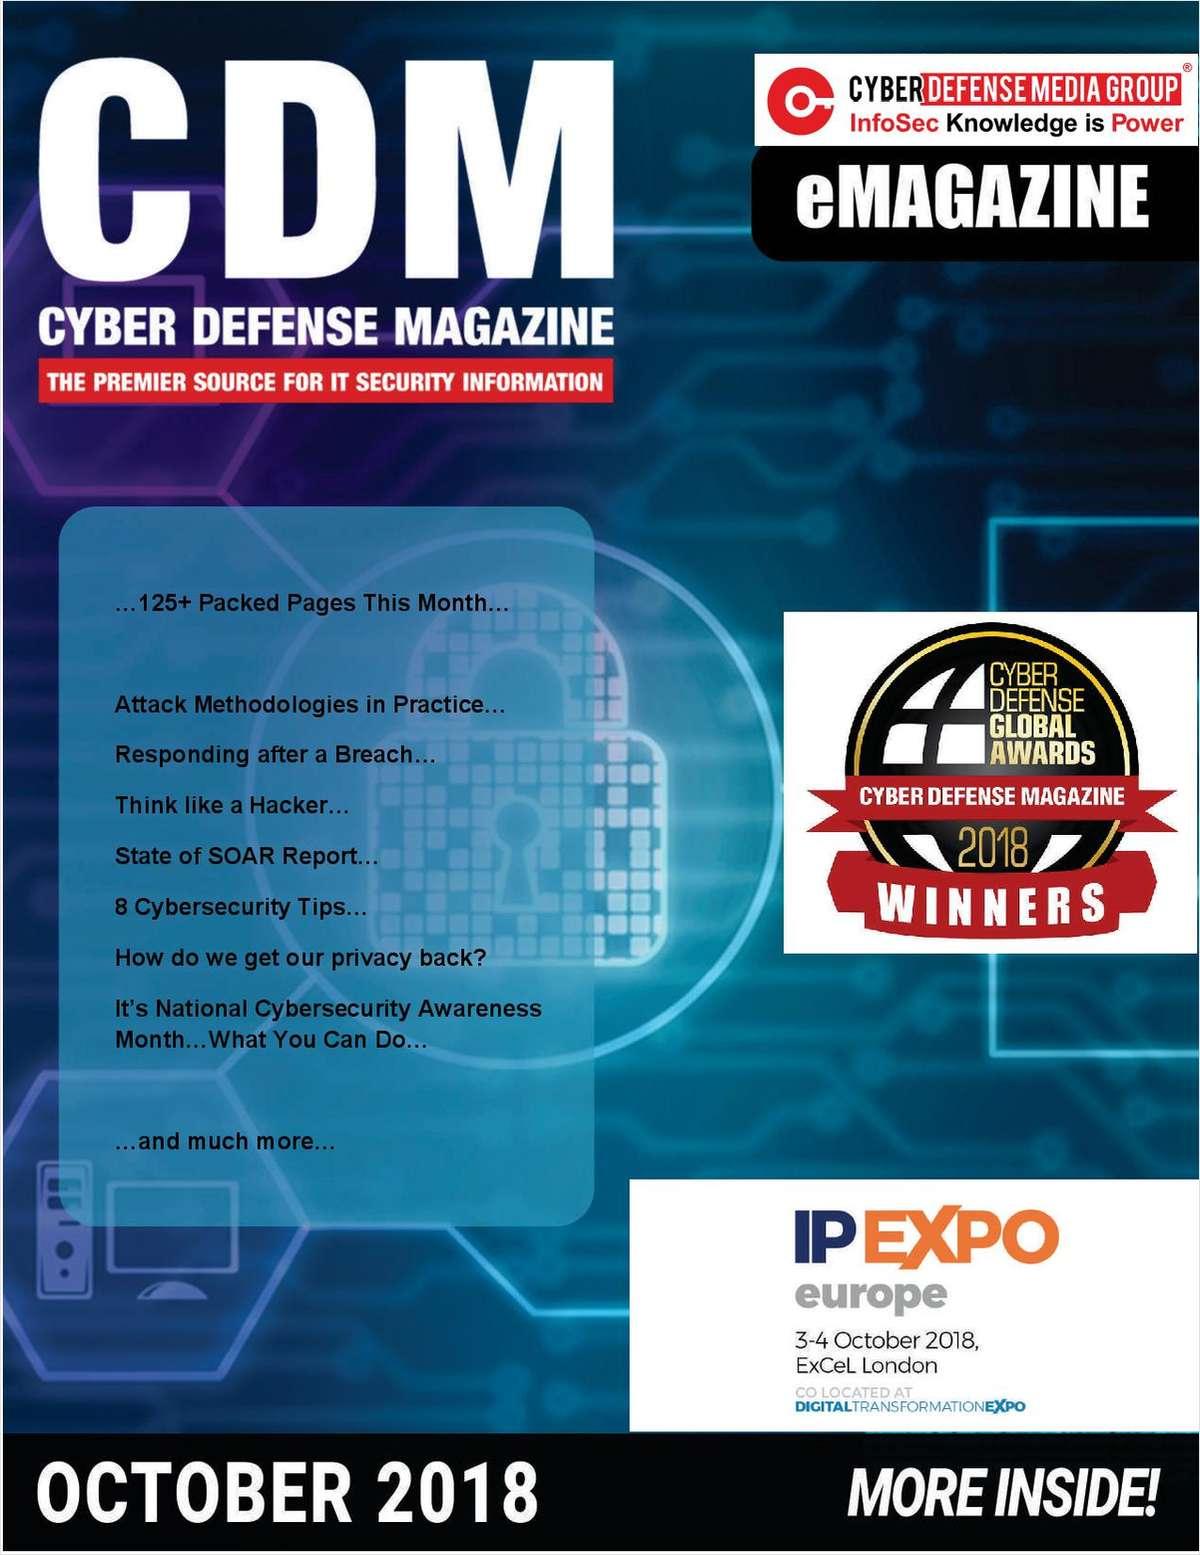 Cyber Defense eMagazine - Attack Methodologies in Practice - October 2018 Edition